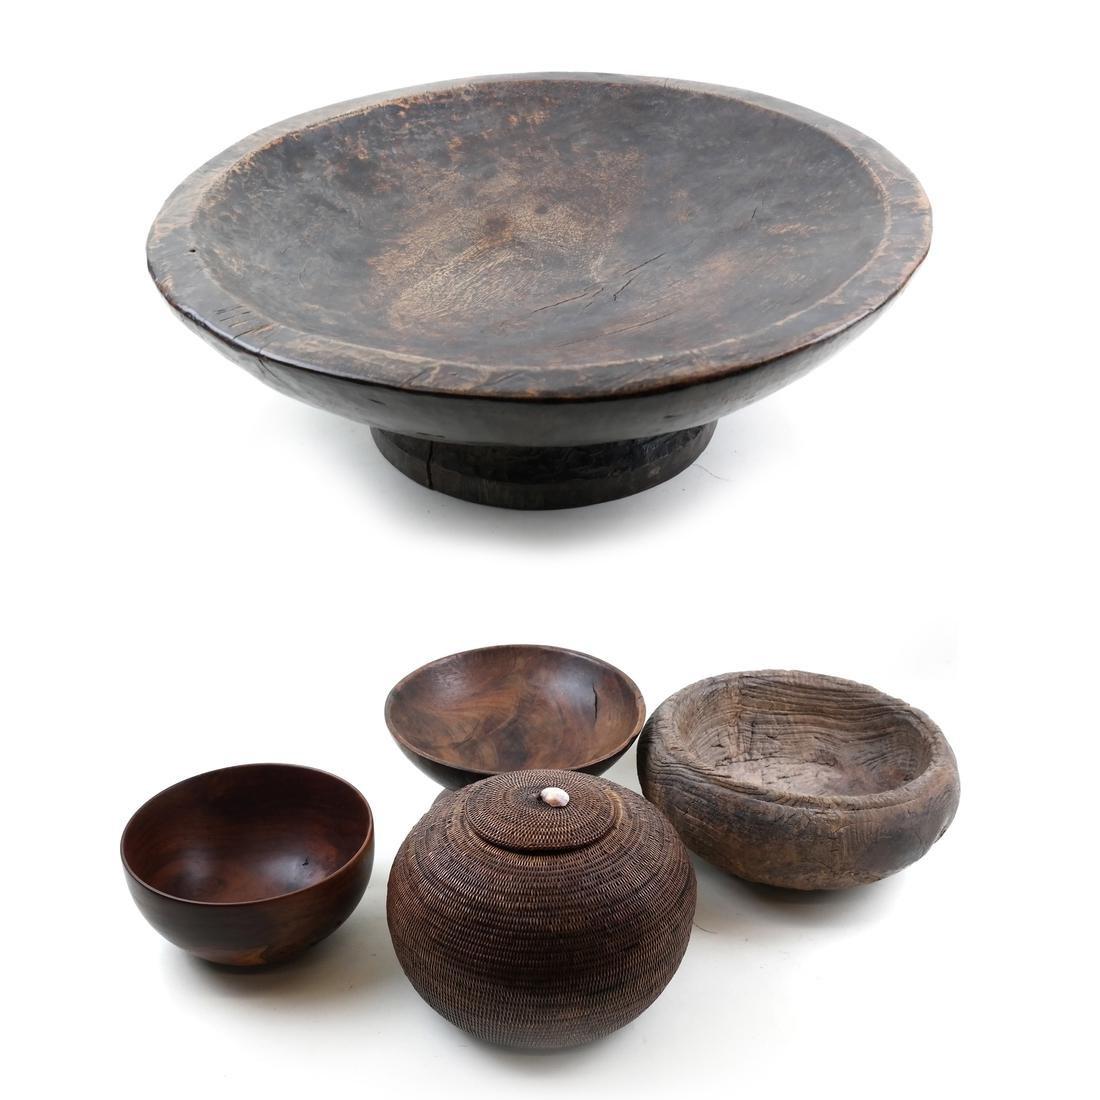 International Ethnographic Vessels